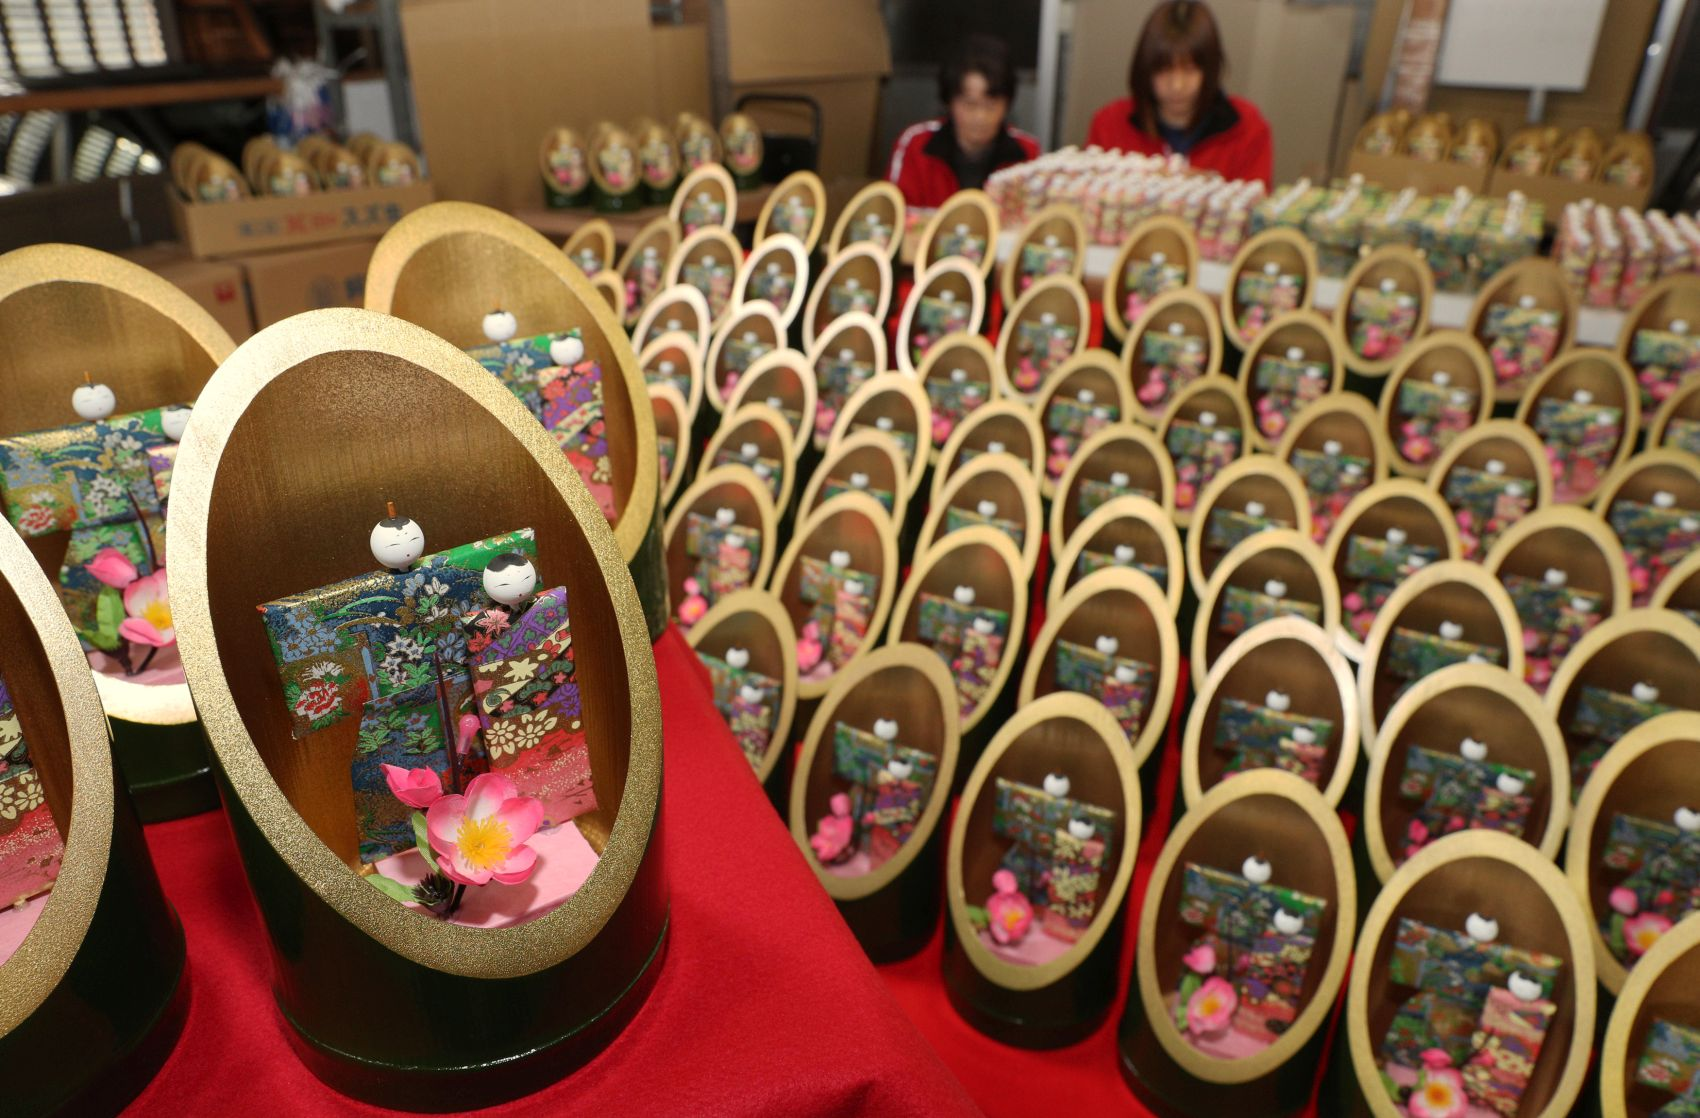 [Hidden Wonders of Japan] For Girls' Festival, A Princess' Tale Inspires Paper Dolls at Hyogo Shop